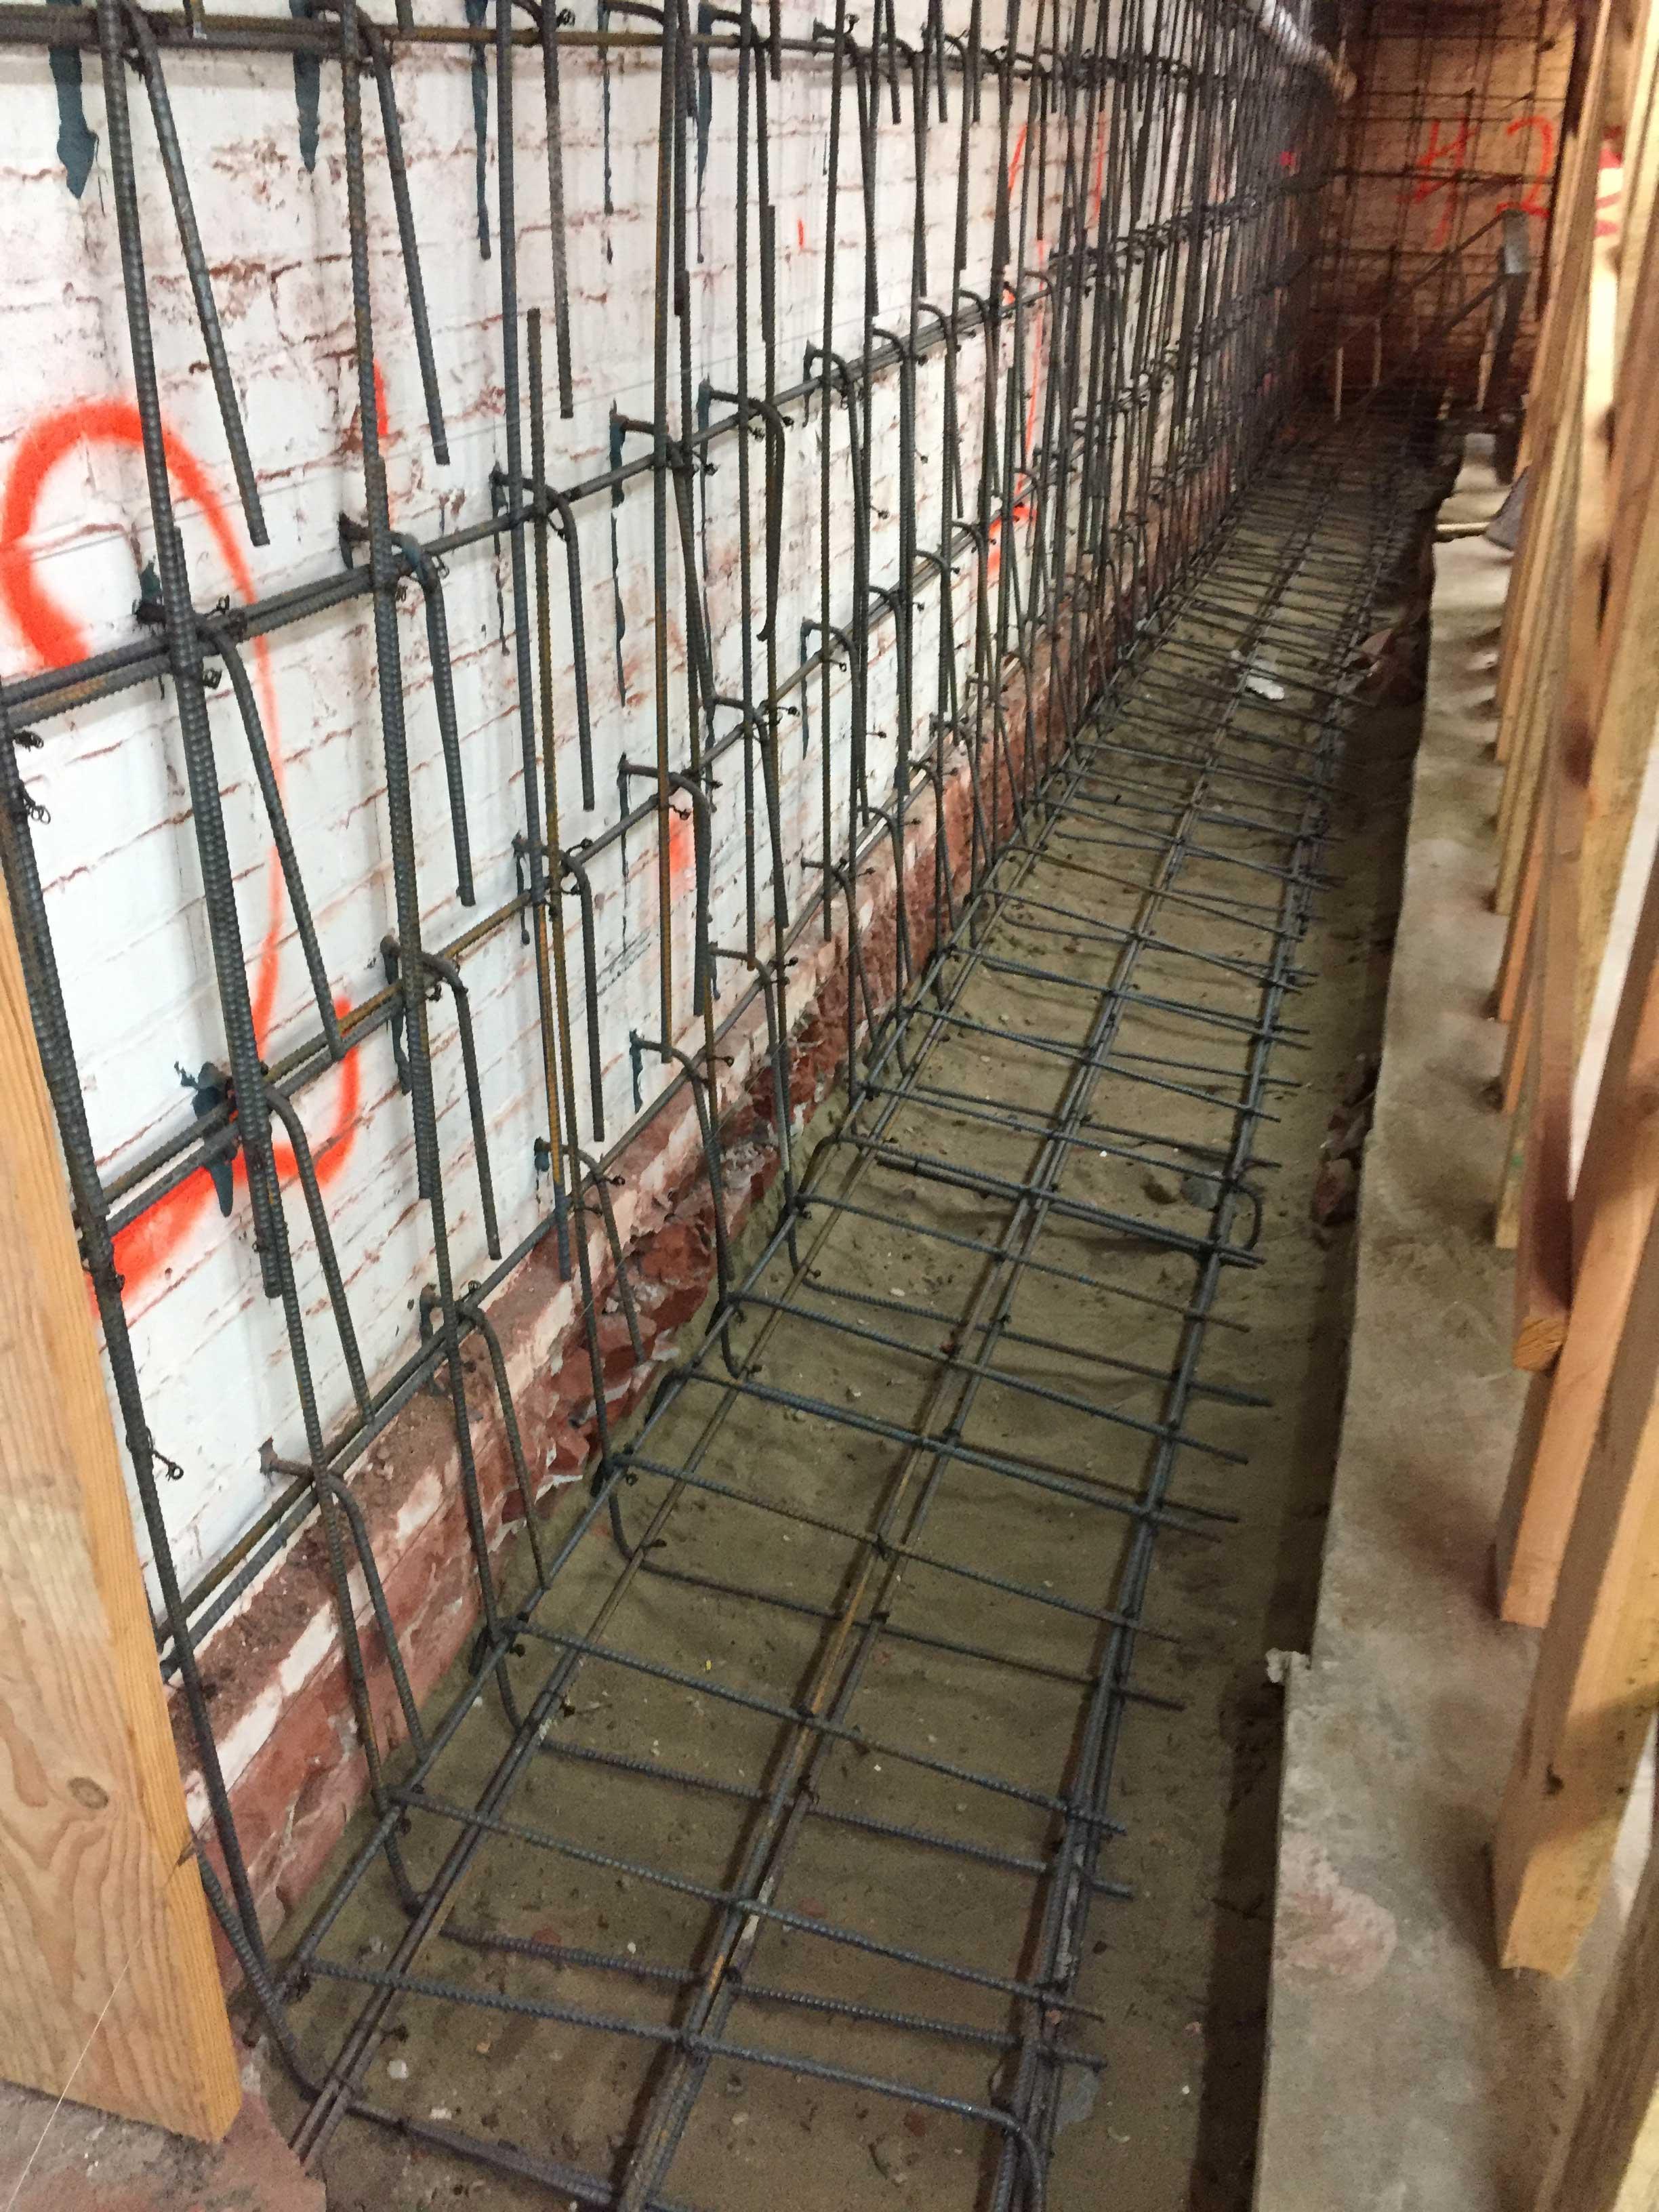 Retro-fit & Seismic Upgrade to Brick Foundation